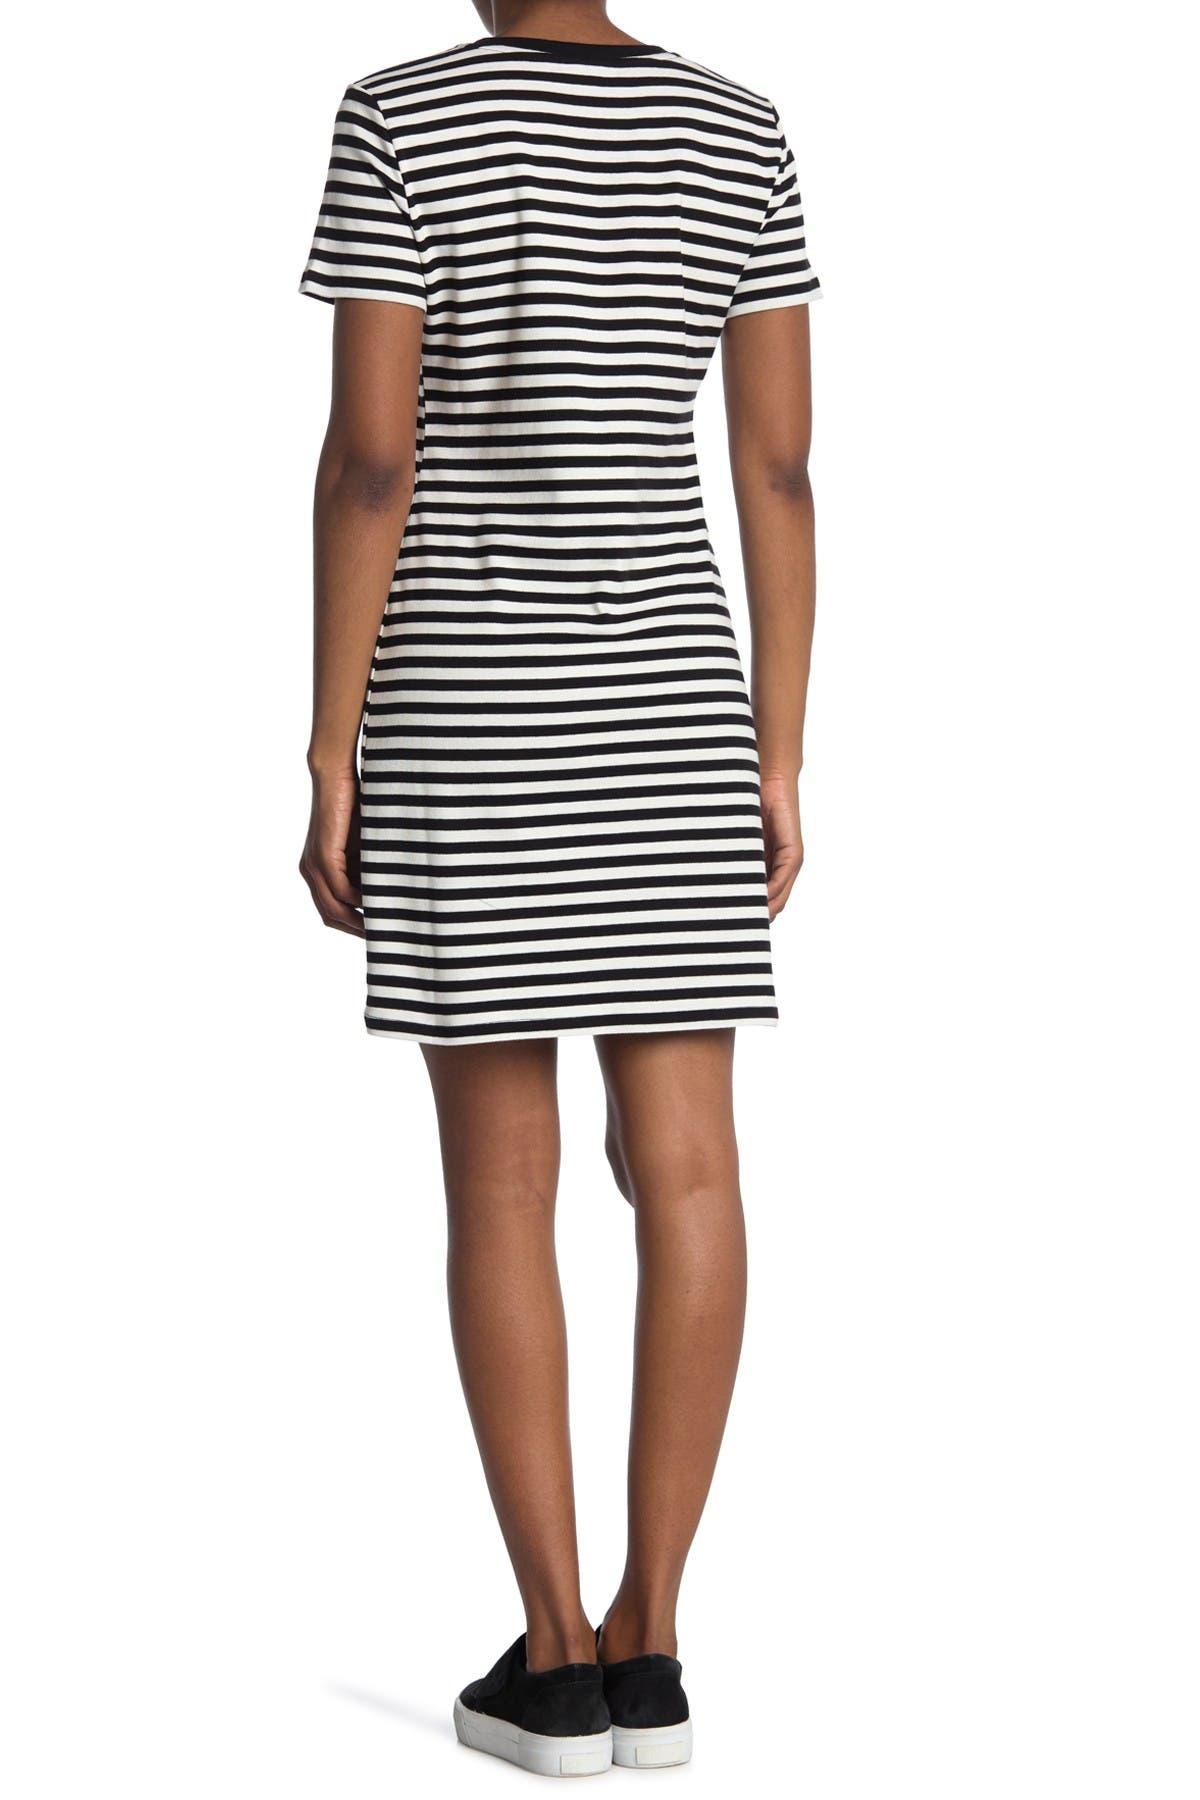 Image of Calvin Klein Stripe Logo Print T-Shirt Dress